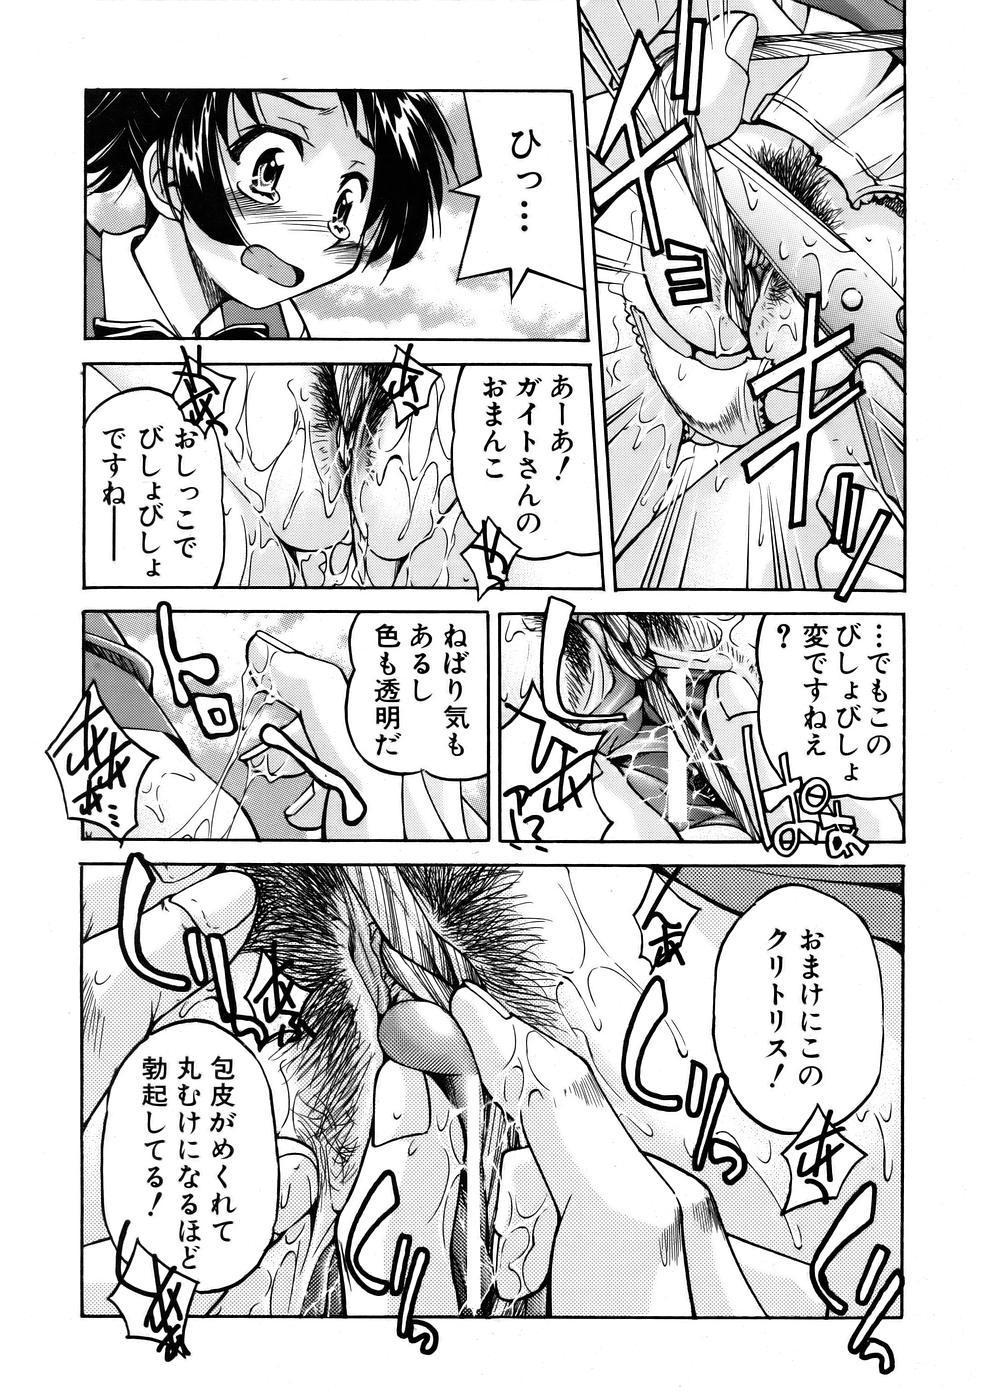 COMIC AUN 2005-10 Vol. 113 219